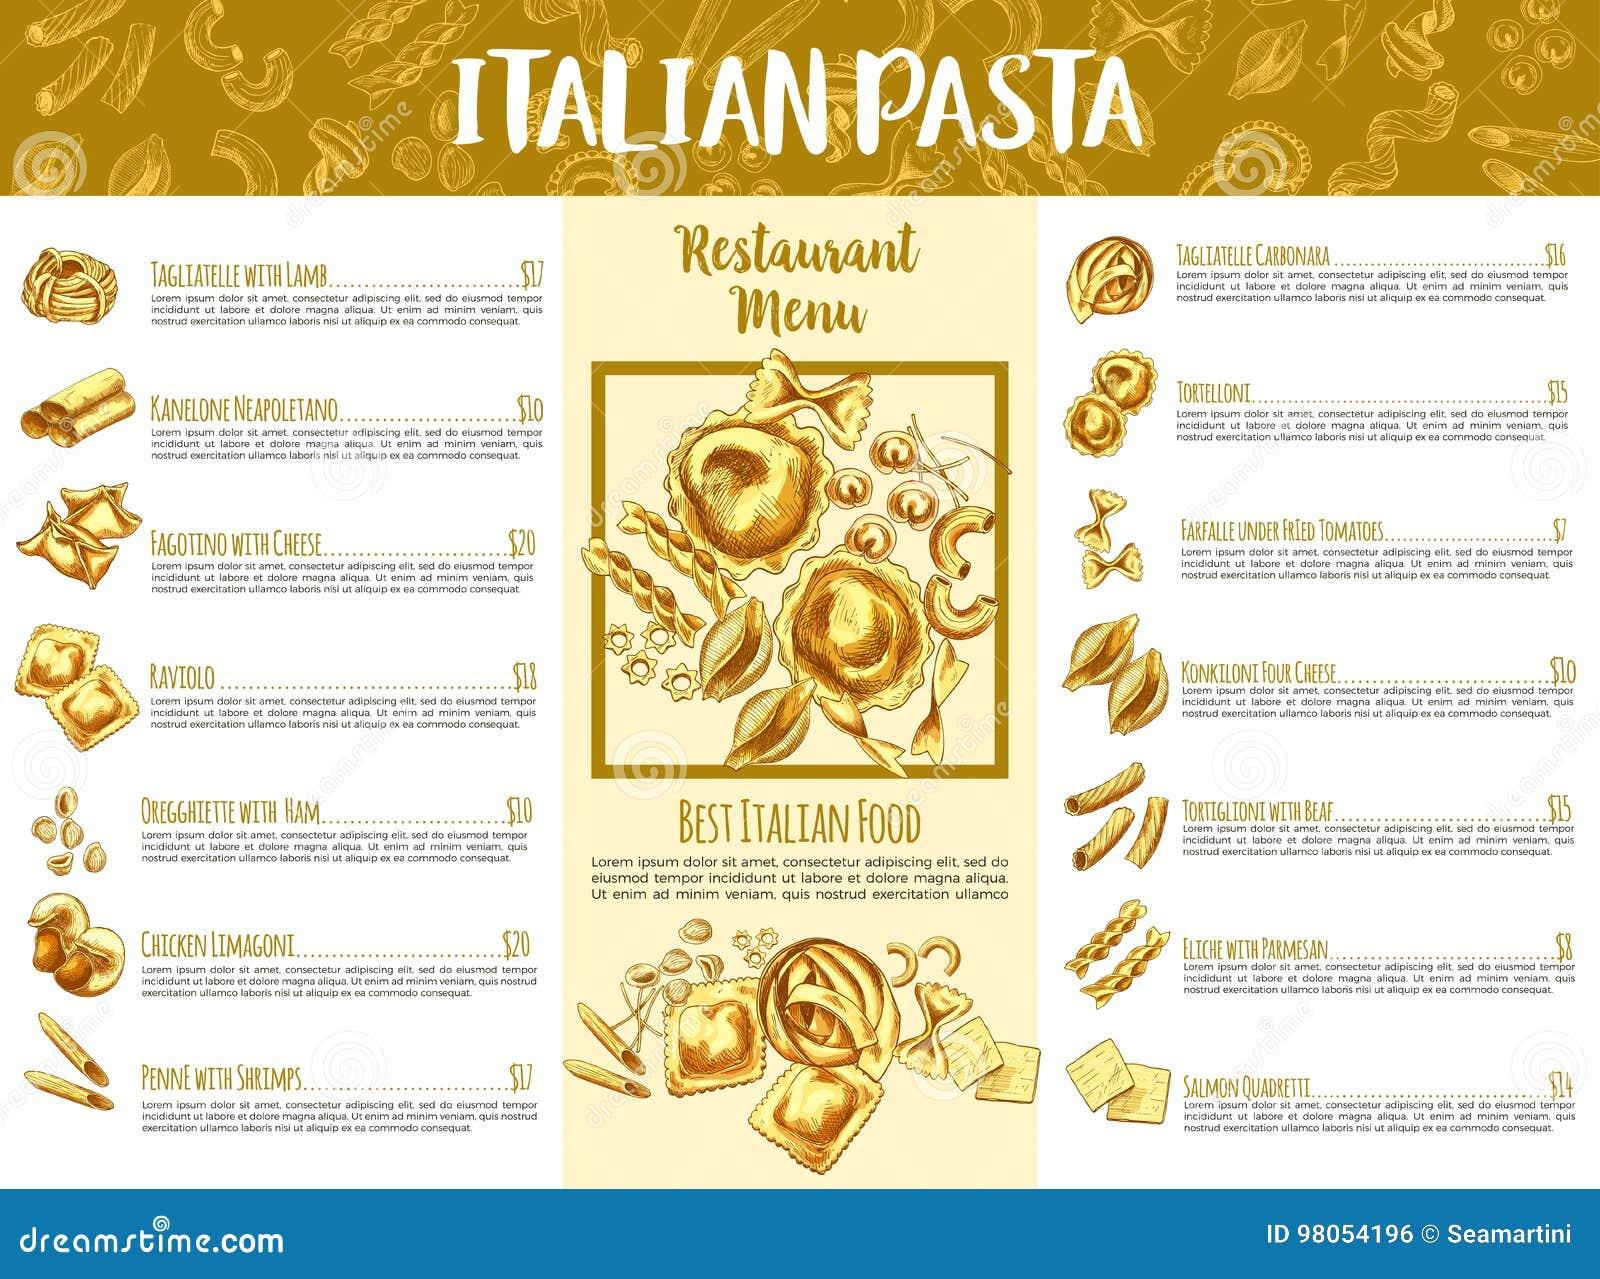 Italian Pasta Menu Template For Restaurant Design Stock Vector